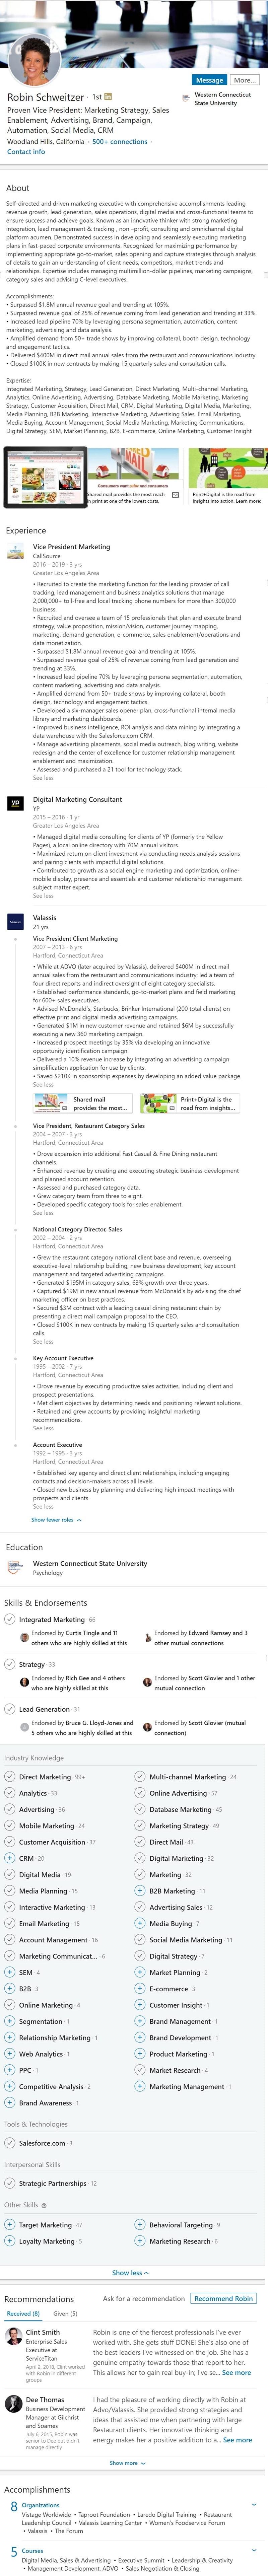 Marketing Strategy Linkedin Profile Example  1573